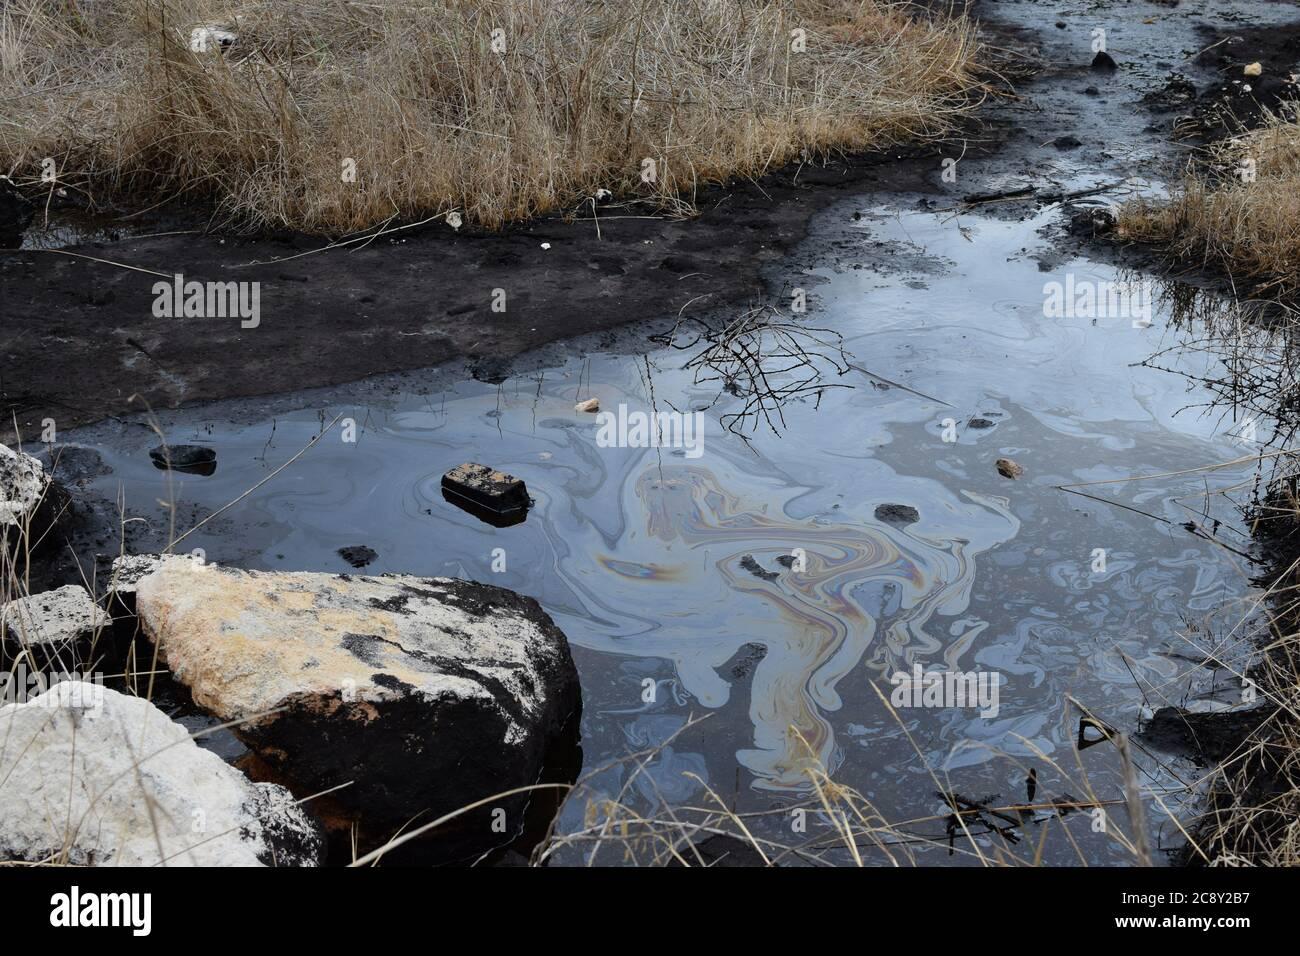 Catrame naturale acqua asfalto buca in palude zona umida. Foto Stock